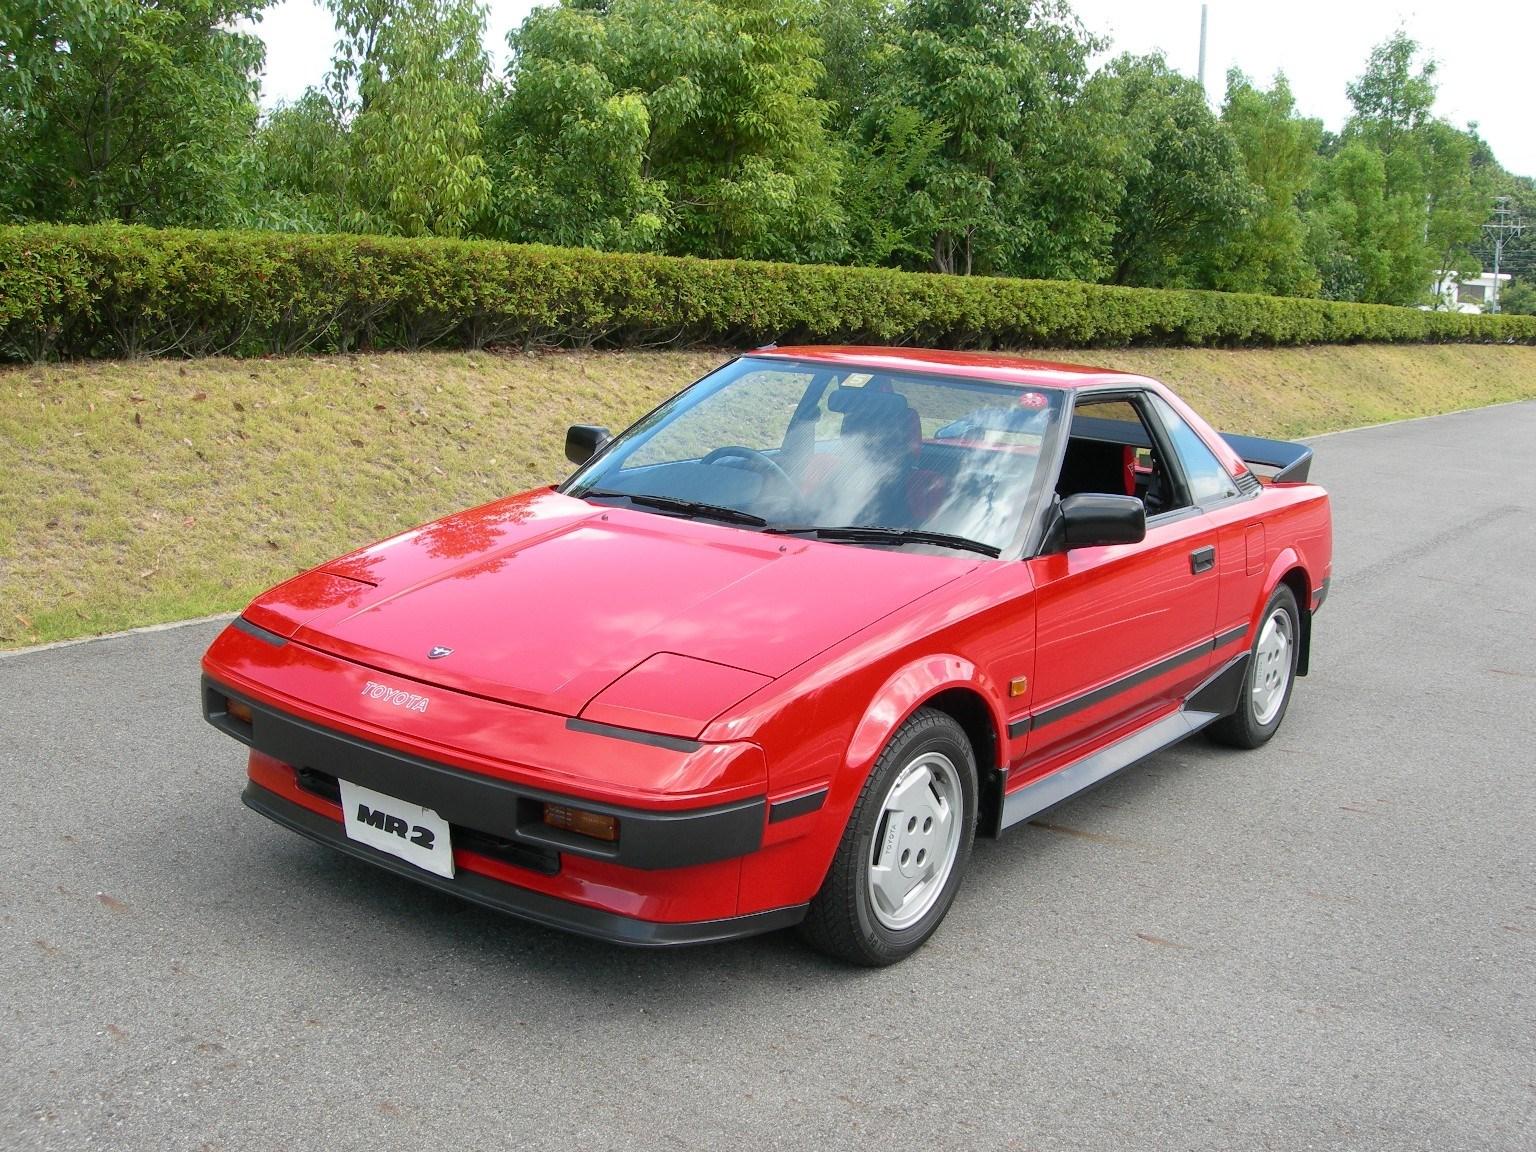 Kelebihan Kekurangan Mazda Mr2 Review